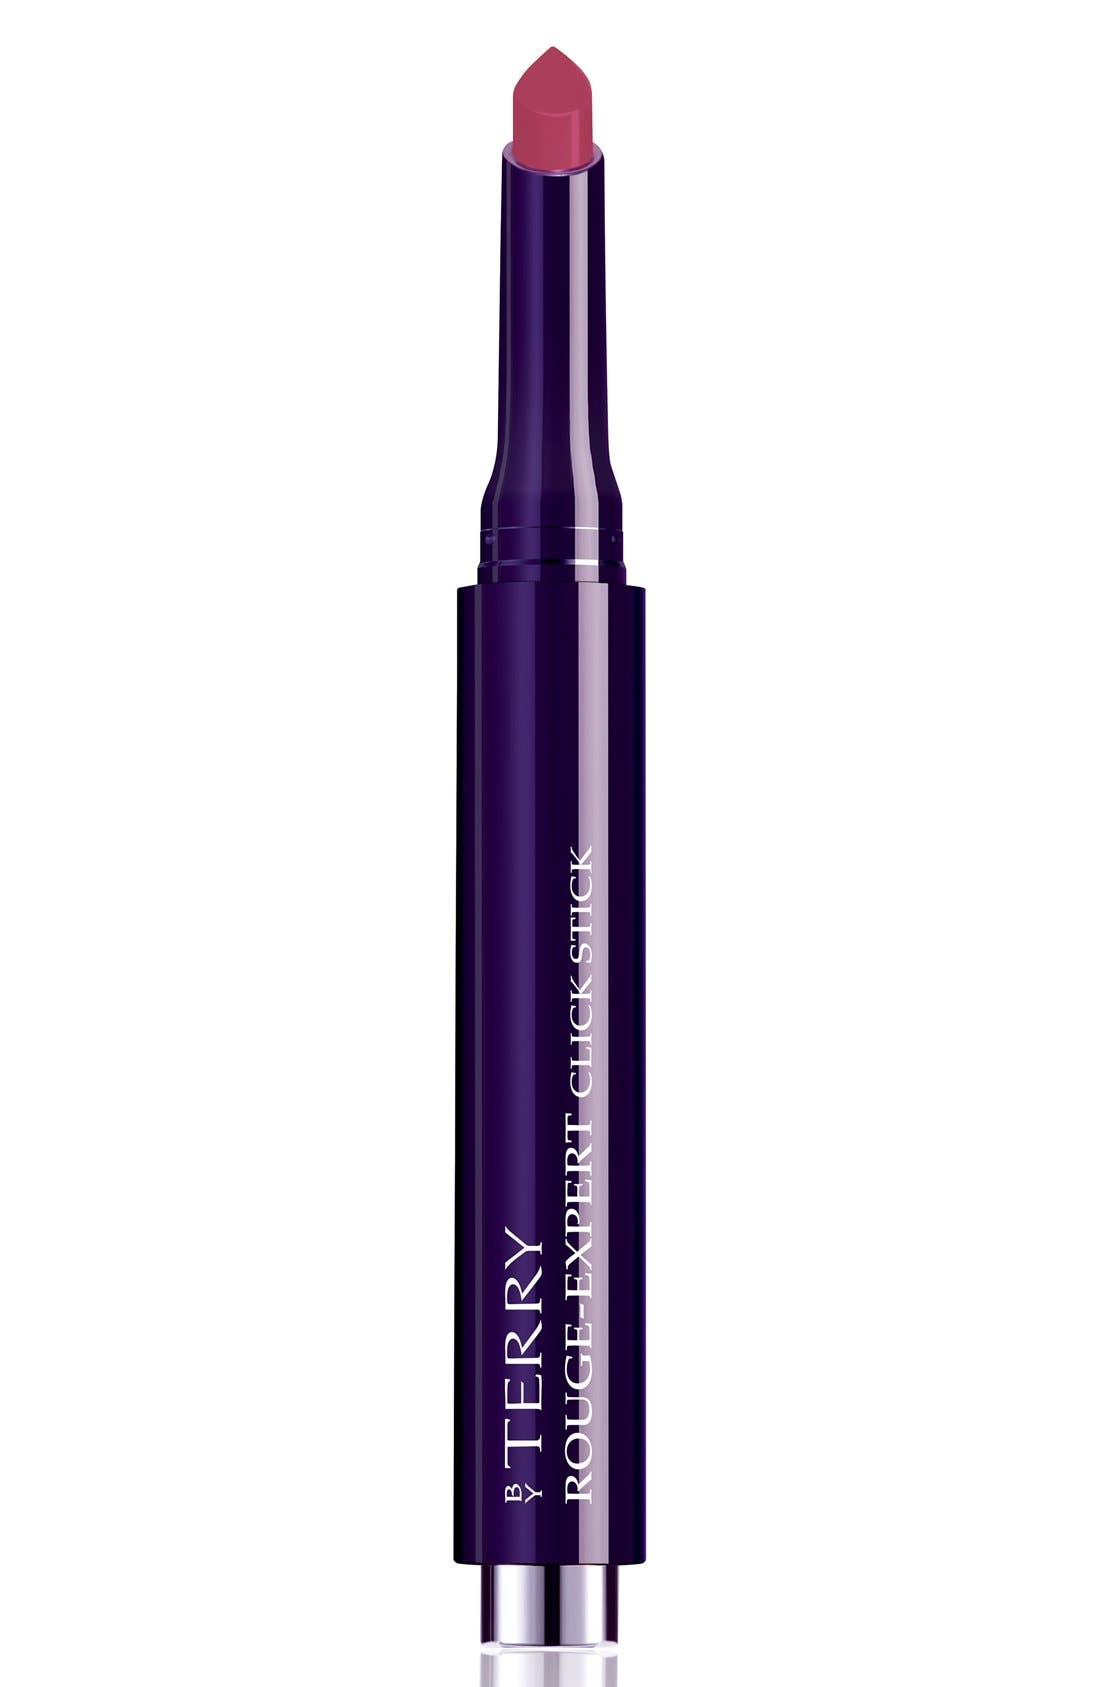 Rouge Expert Click Stick Lipstick